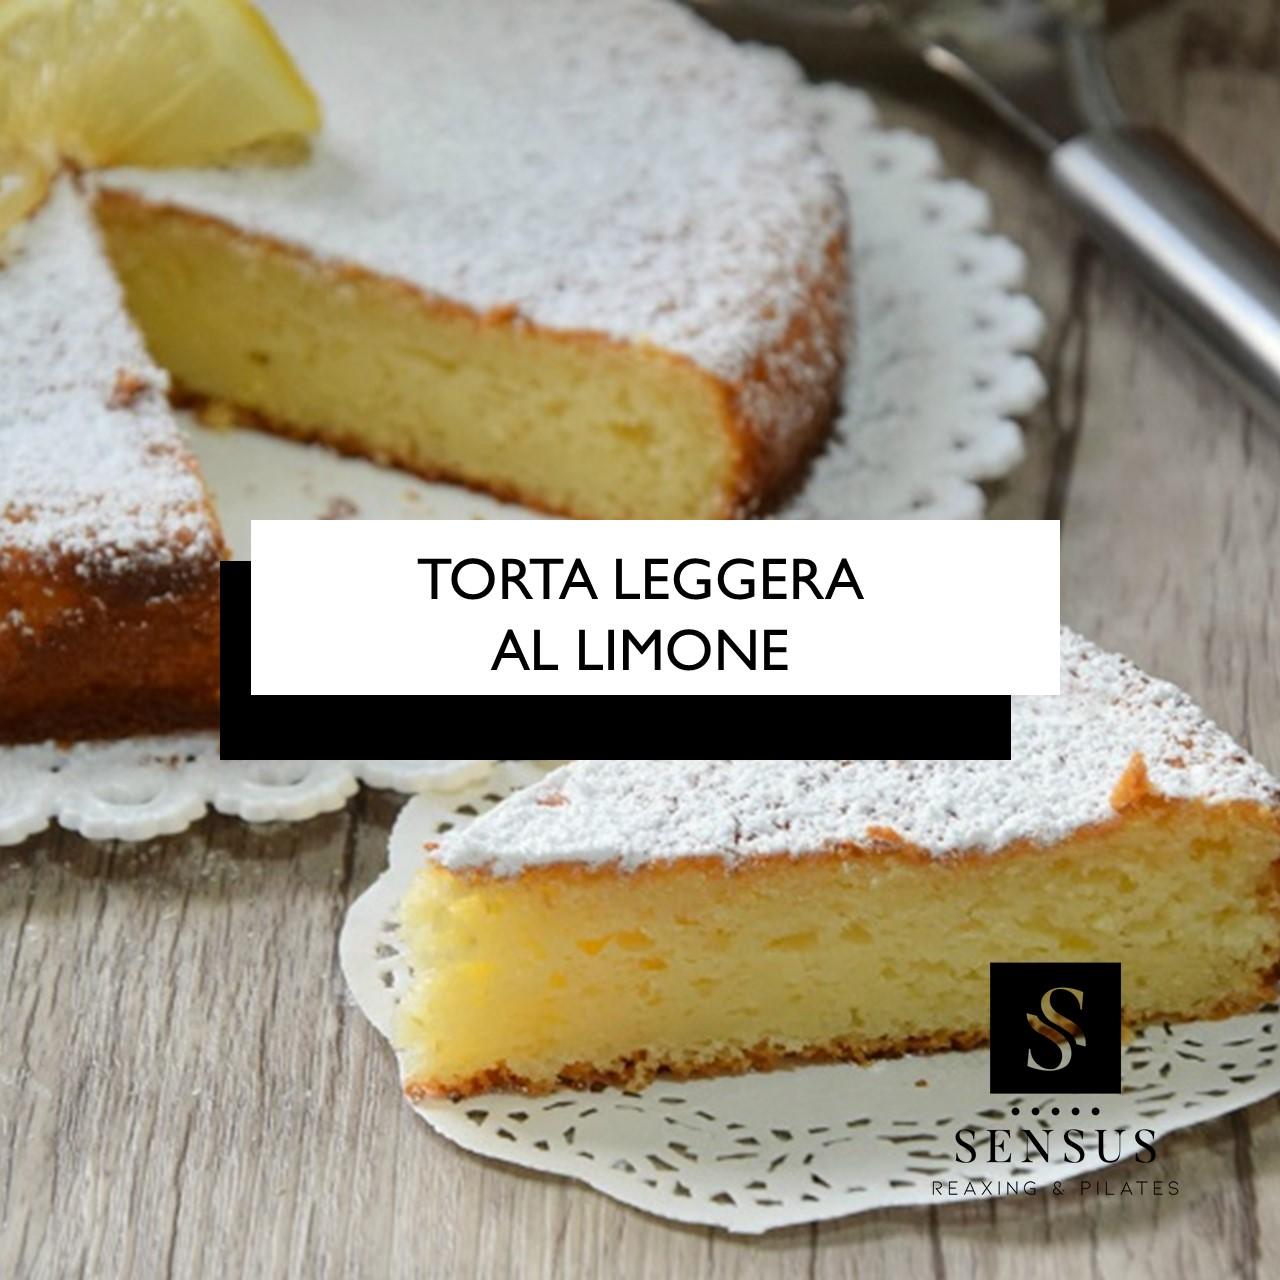 Torta Leggera Al Limone